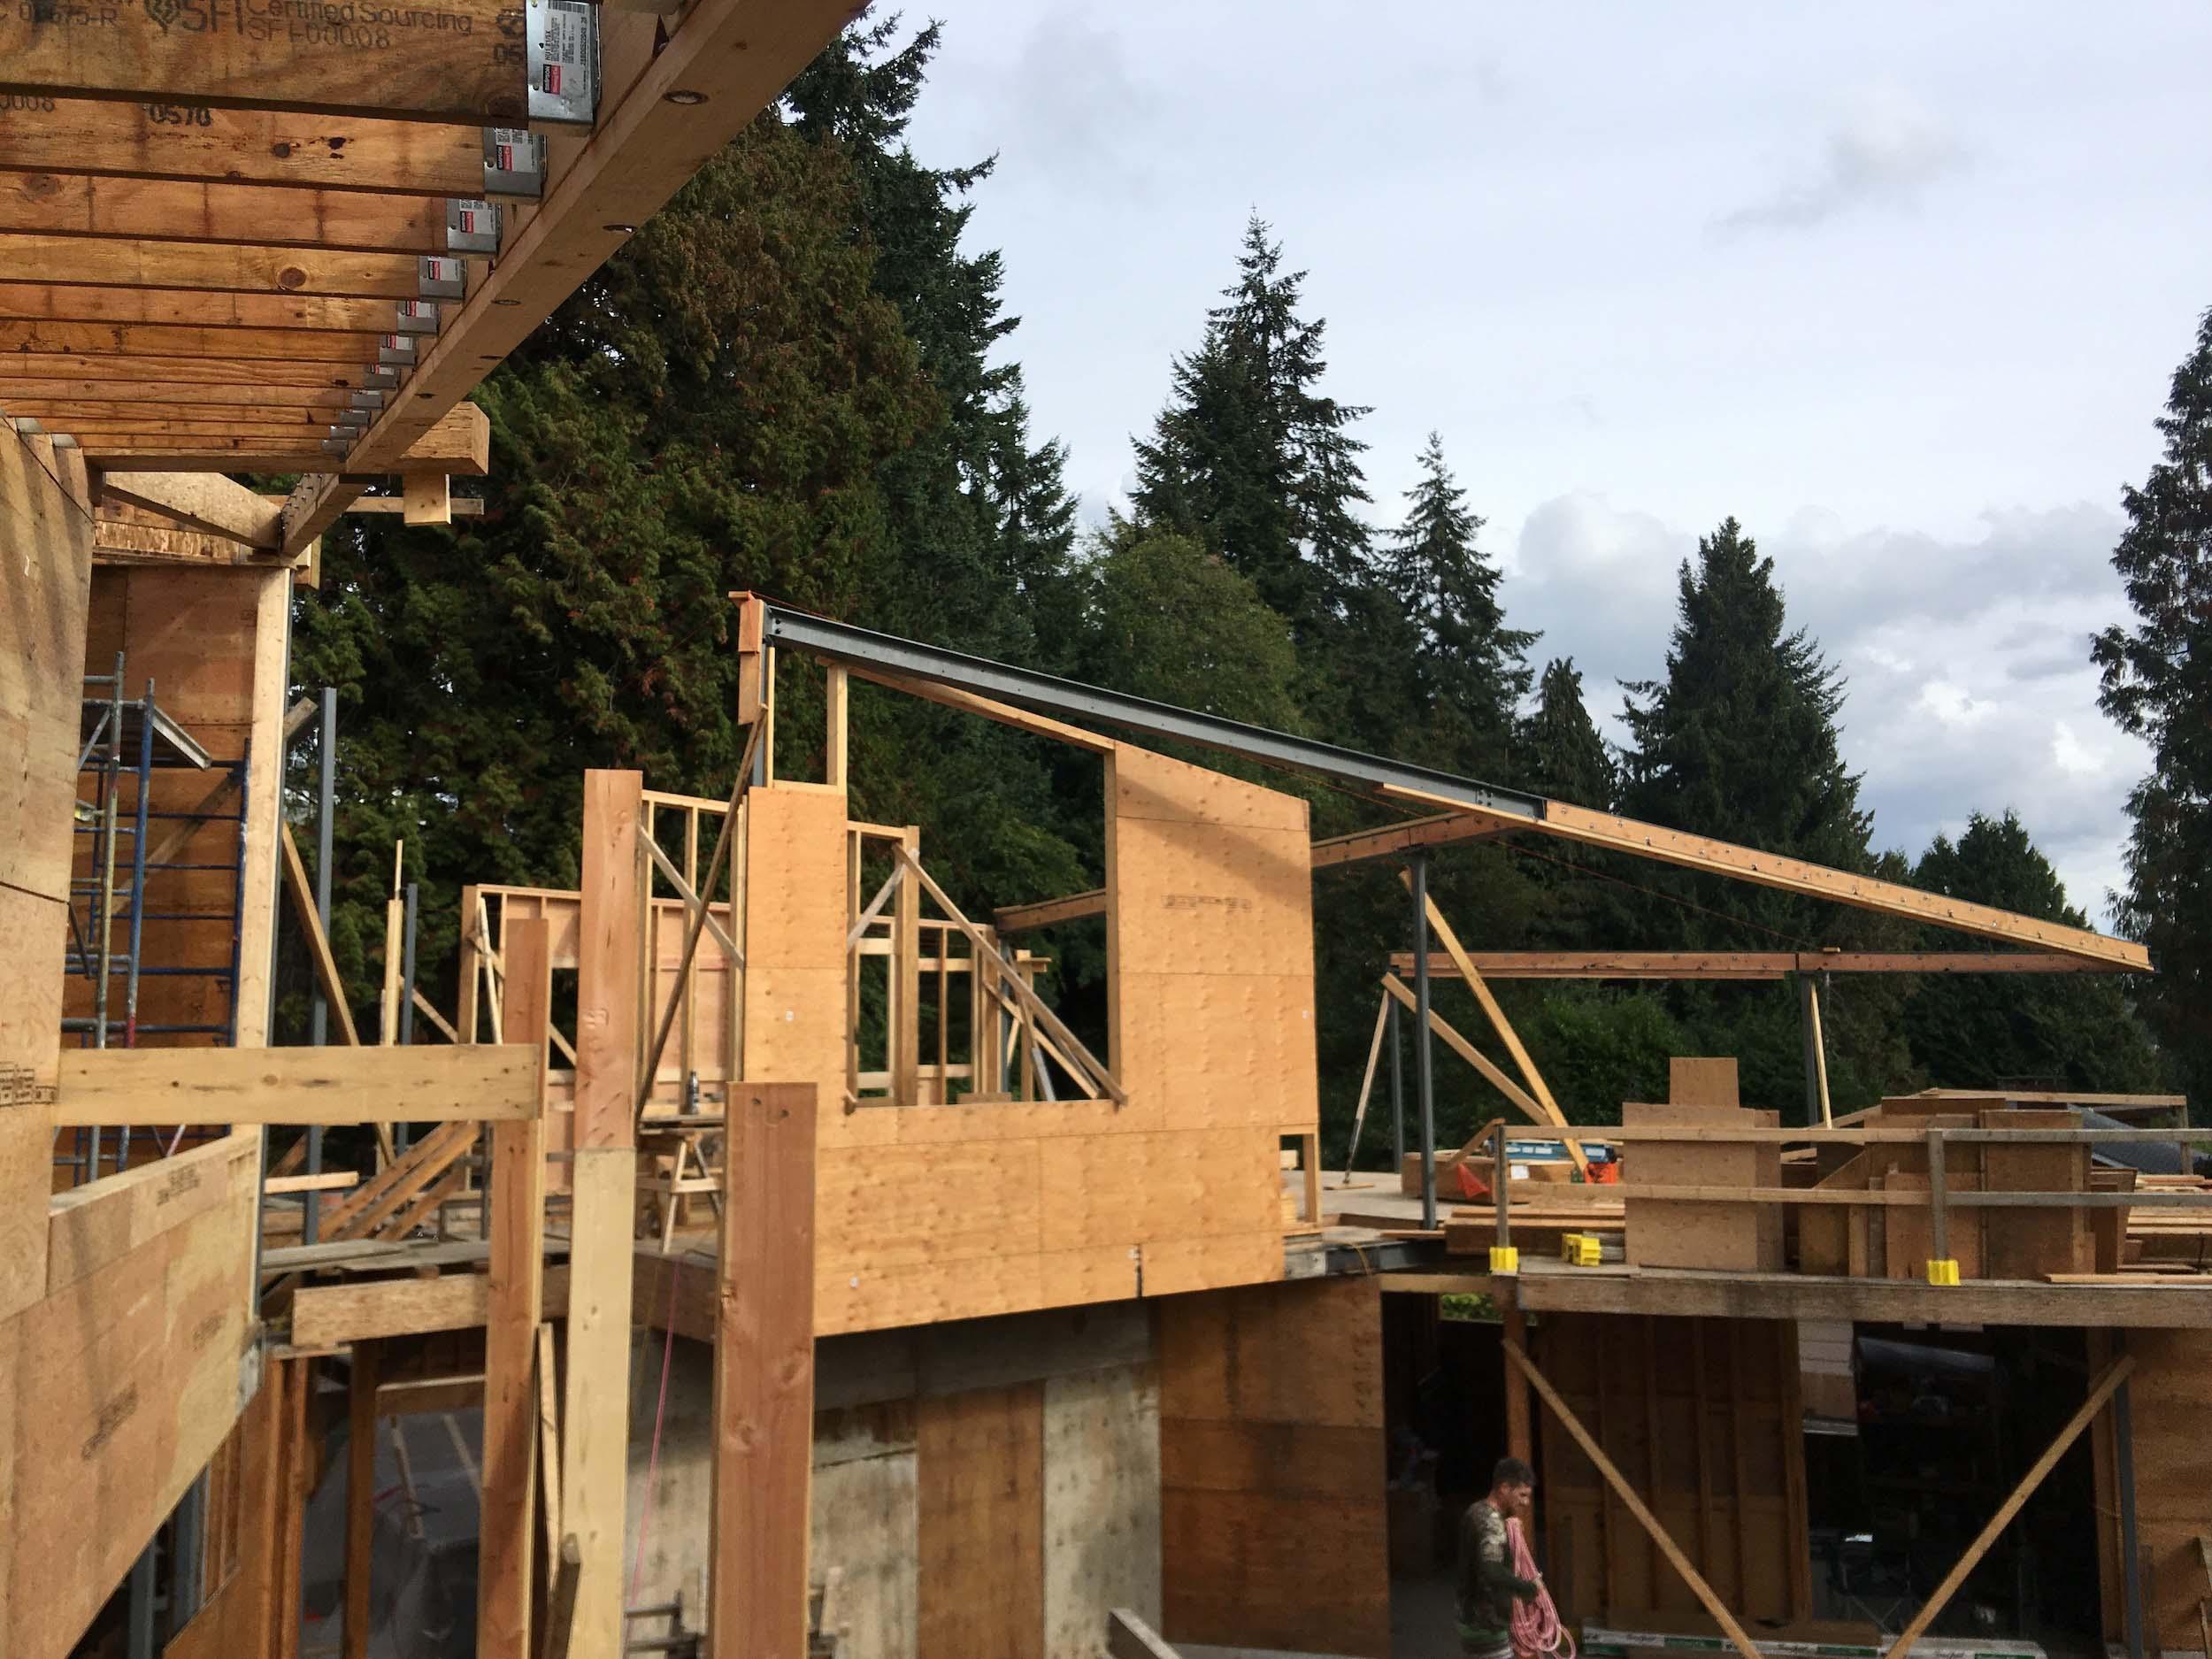 Postle_Construction_WoodFraming14.jpg